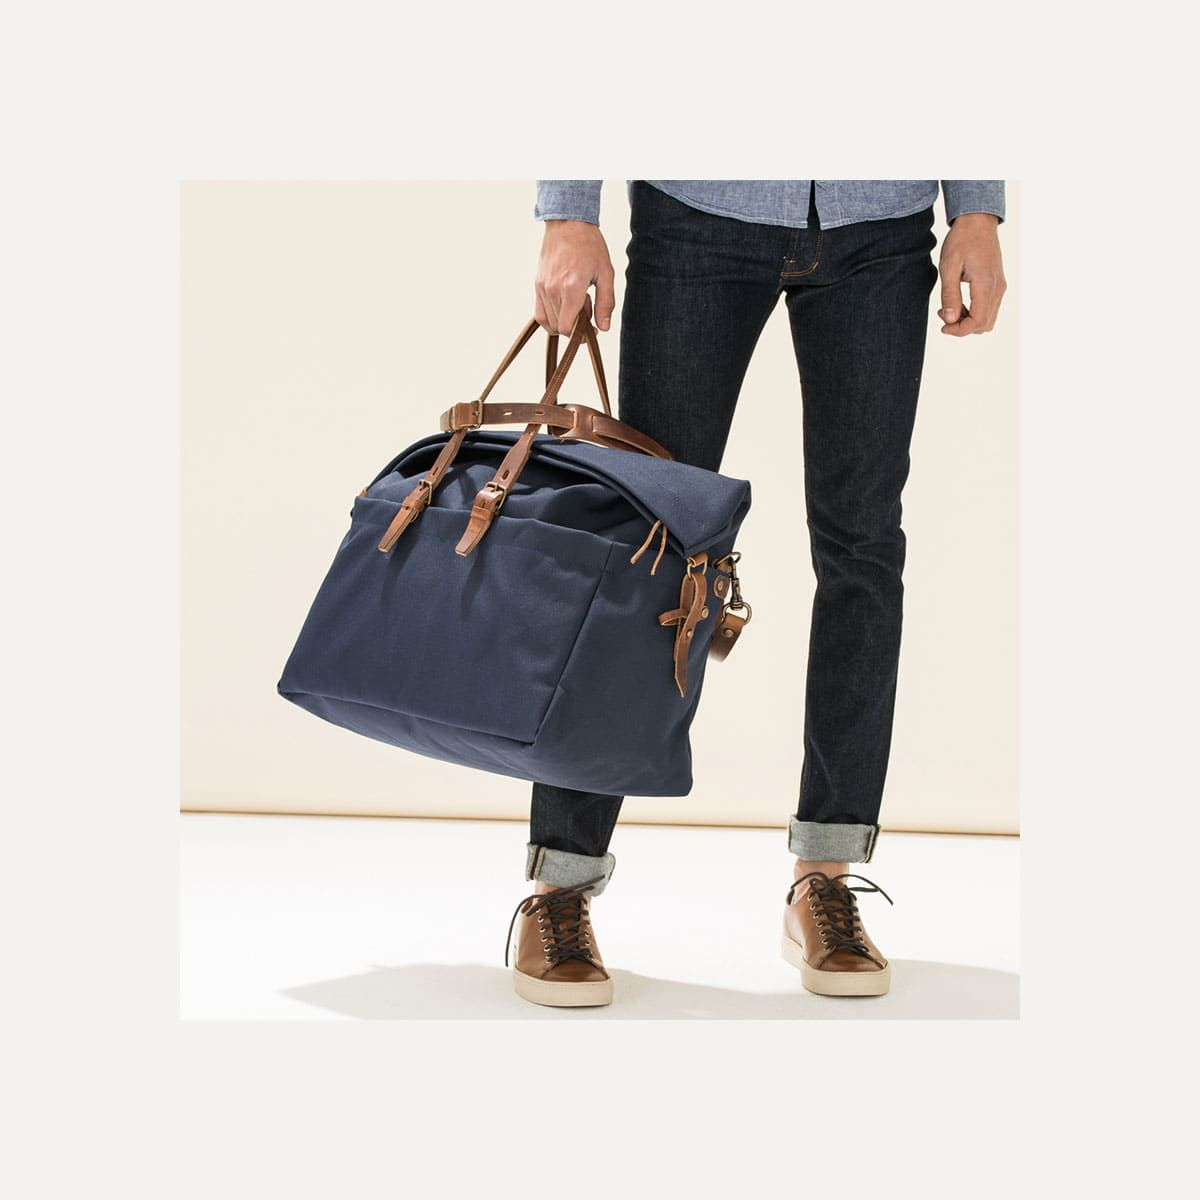 887f49ec2b Sac de voyage toile & cuir Homme - Made in France | Bleu de chauffe ...